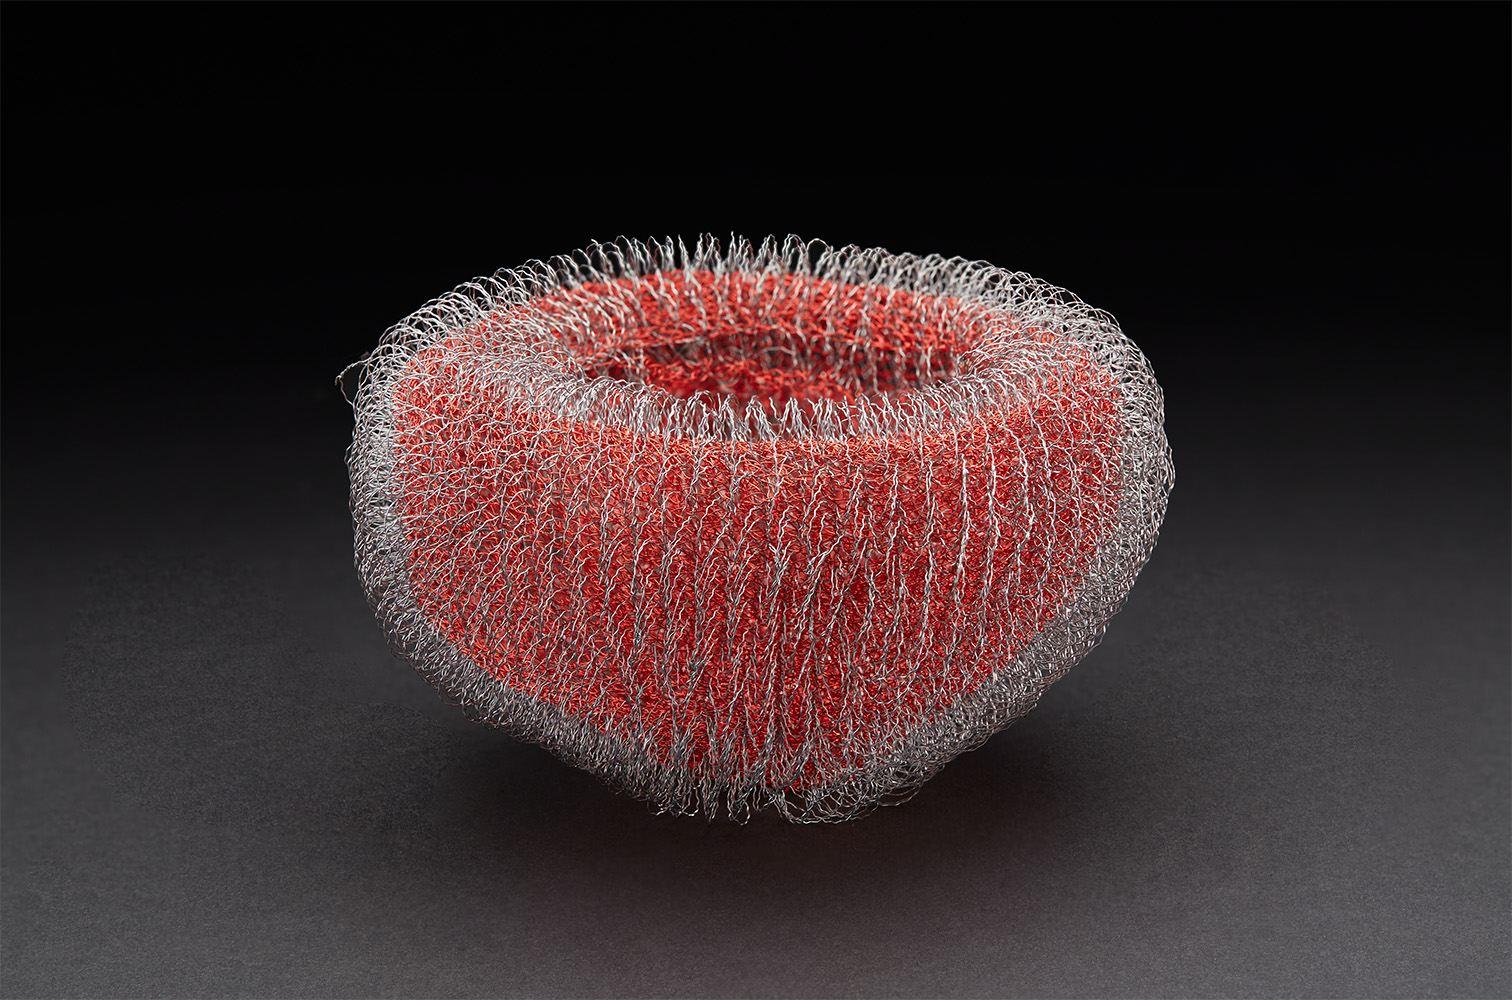 Mieko Kawase  Red 3  , 2017 Wire 4 x 7 x 7 inches 10.2 x 17.8 x 17.8 cm MKe 12